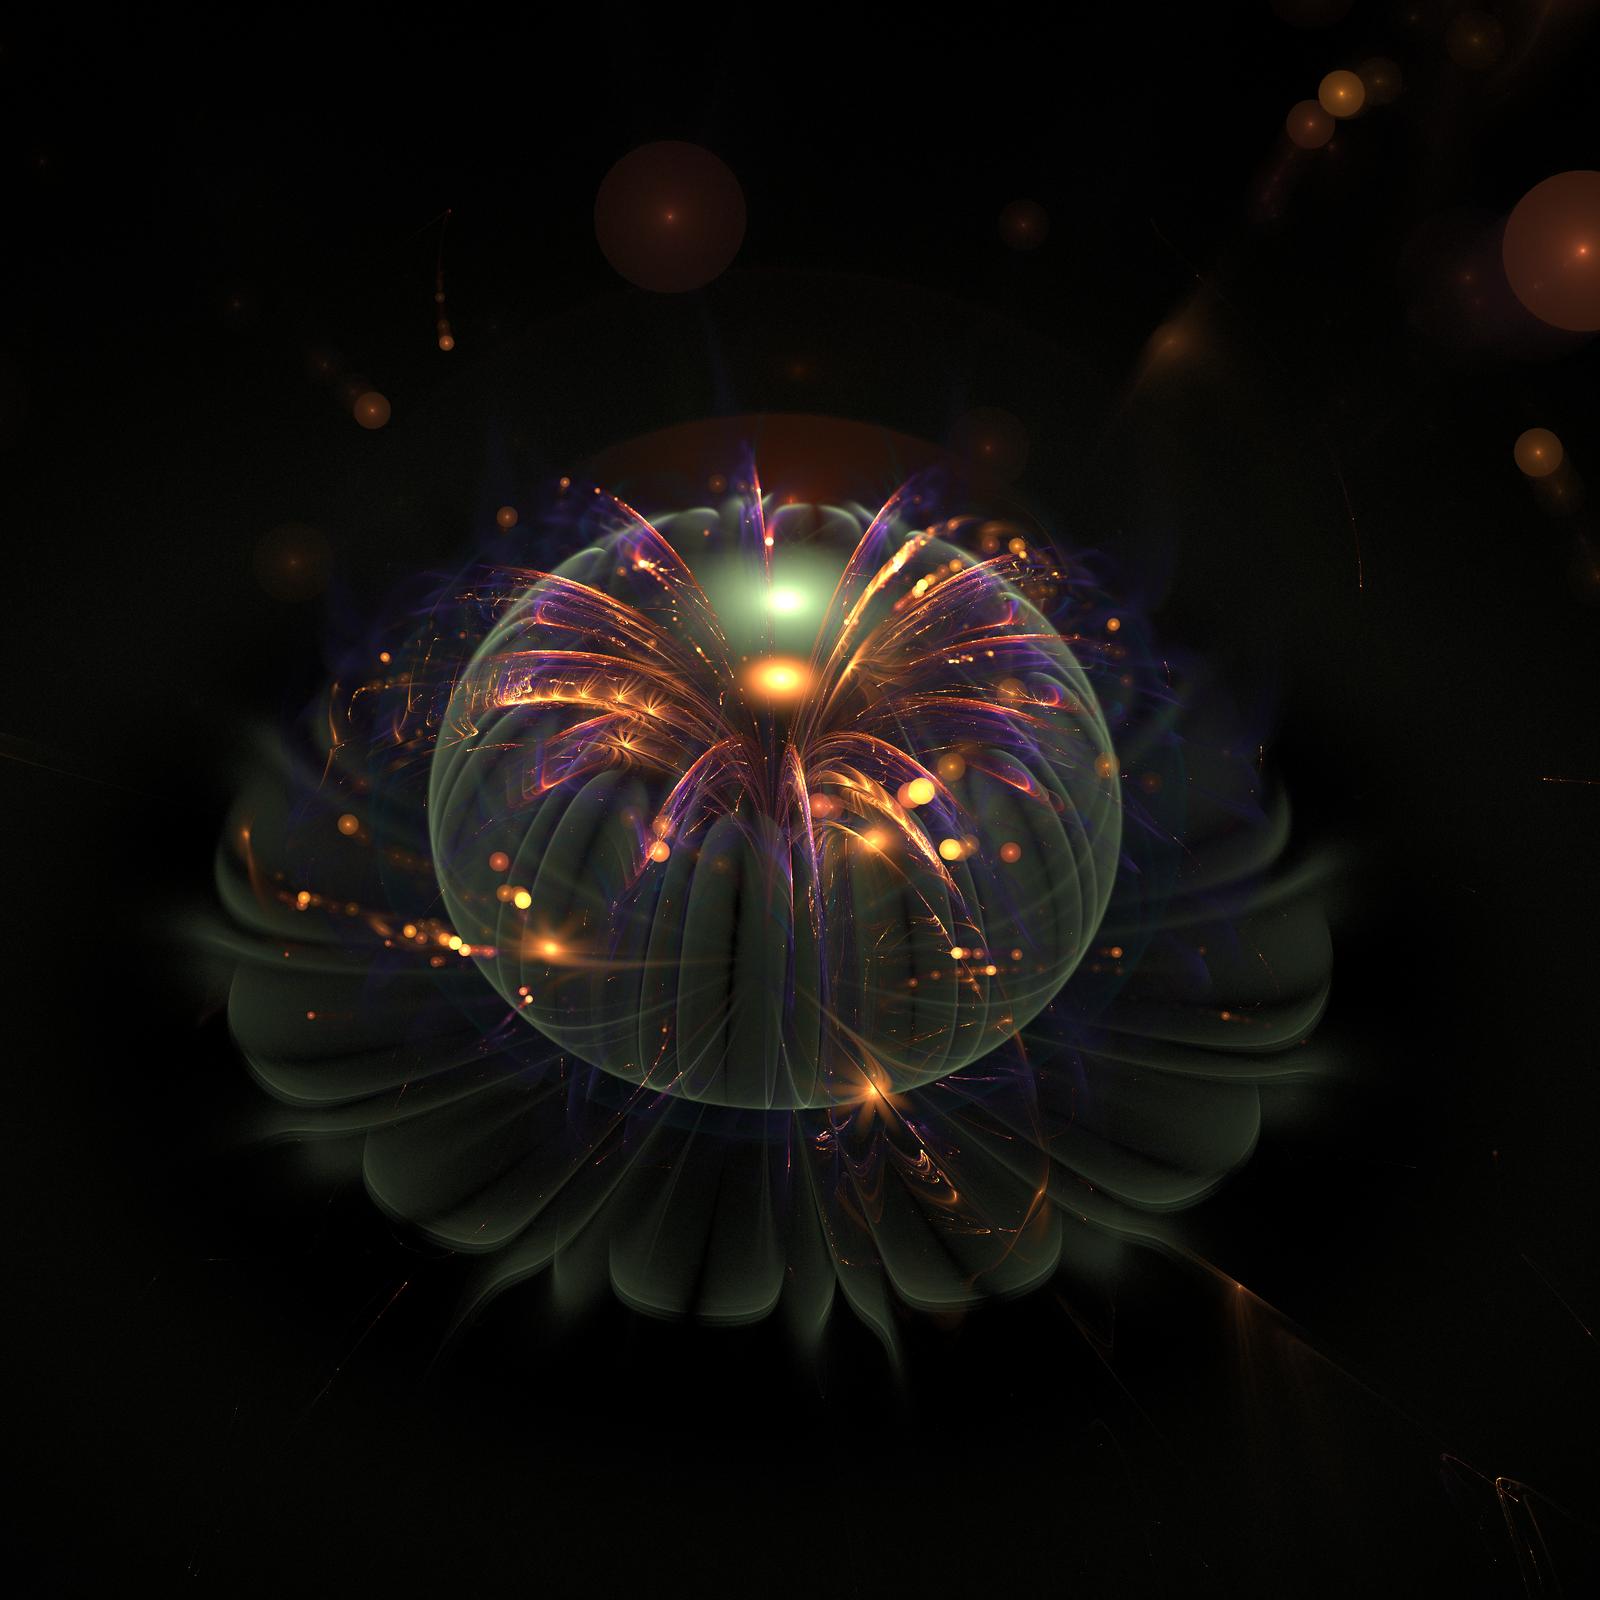 A twinkle in the eye by luisbc